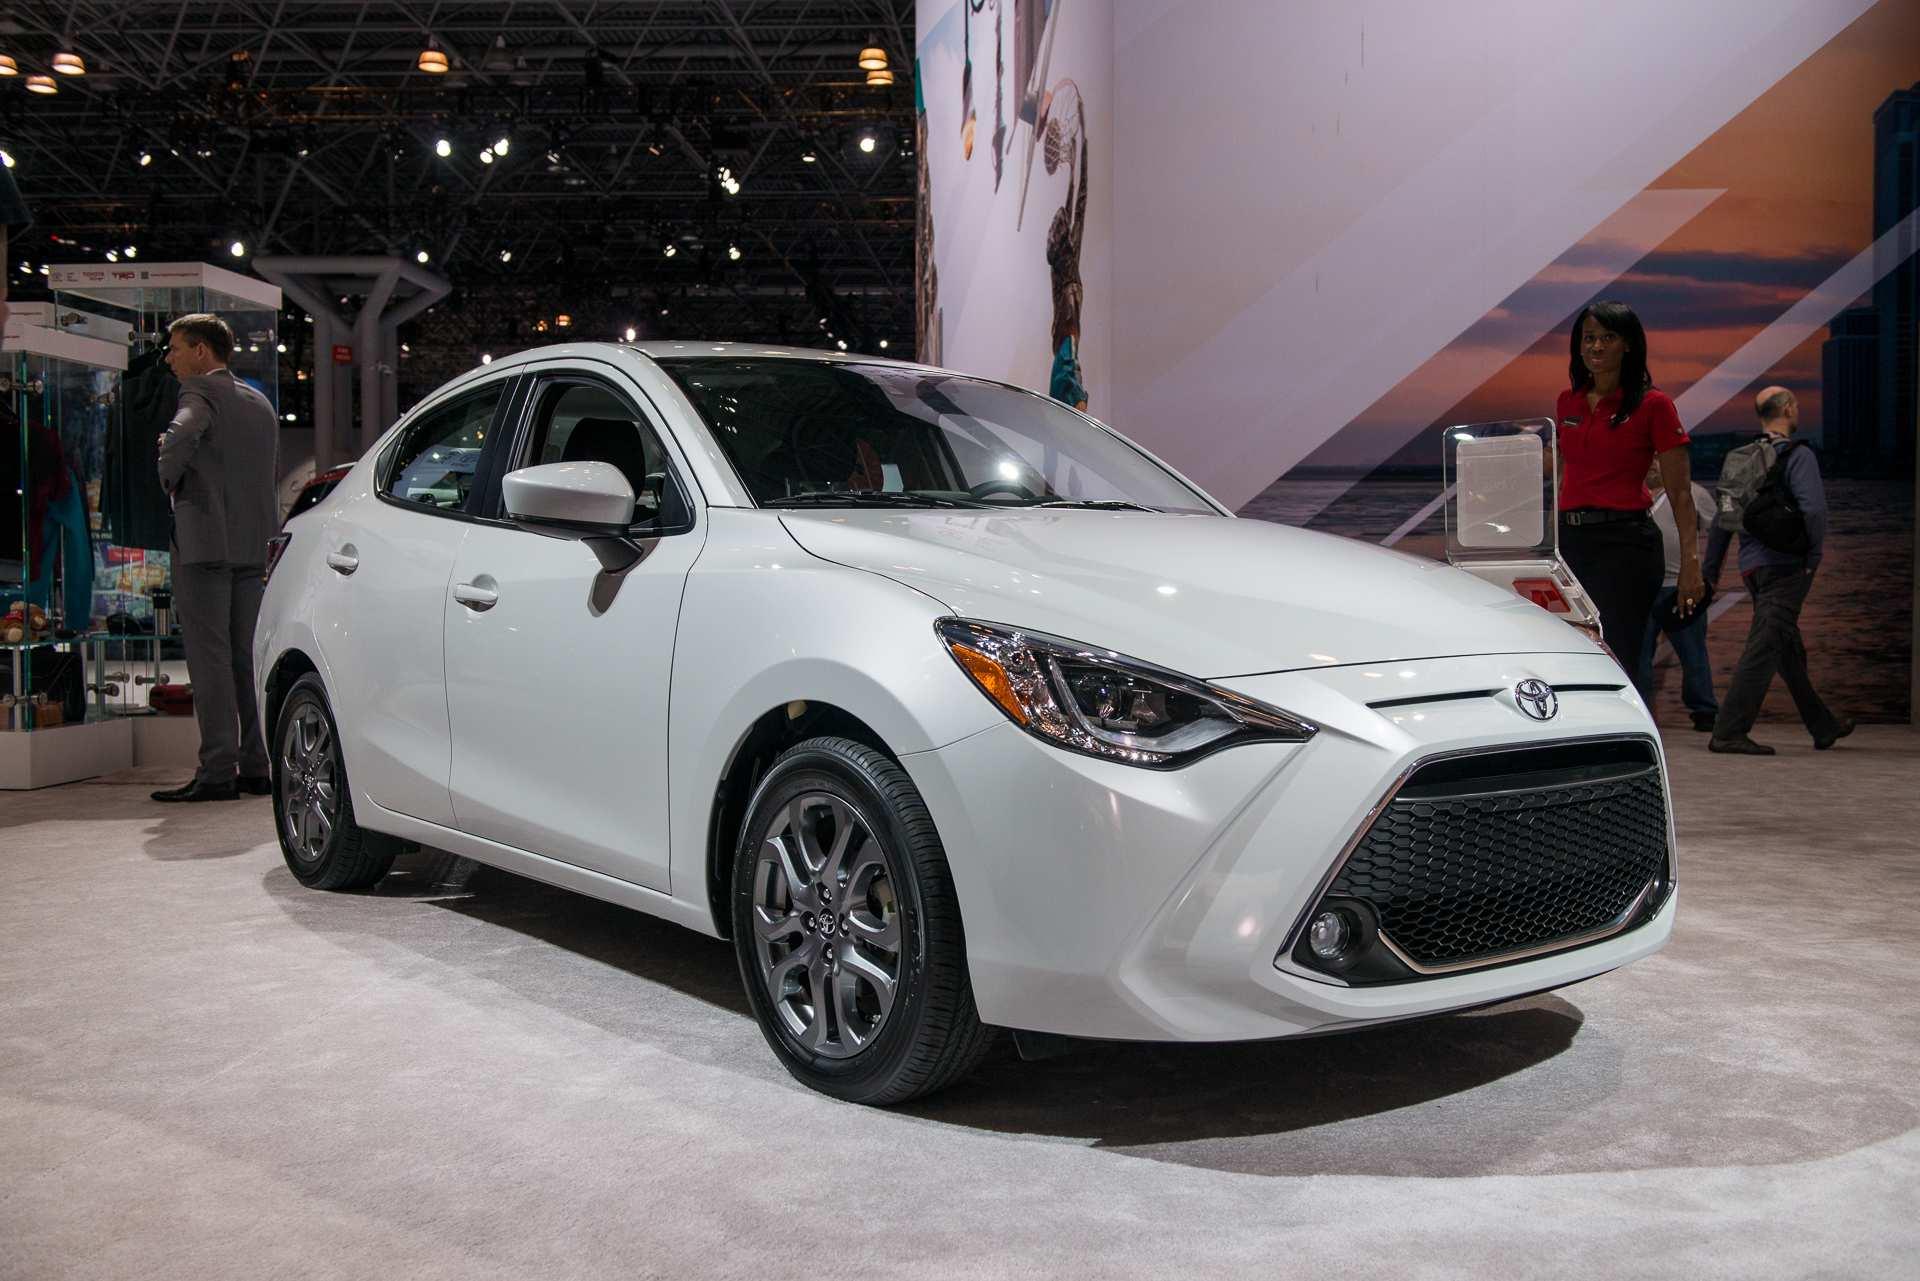 66 Concept of Toyota Yaris Sedan 2020 Specs for Toyota Yaris Sedan 2020